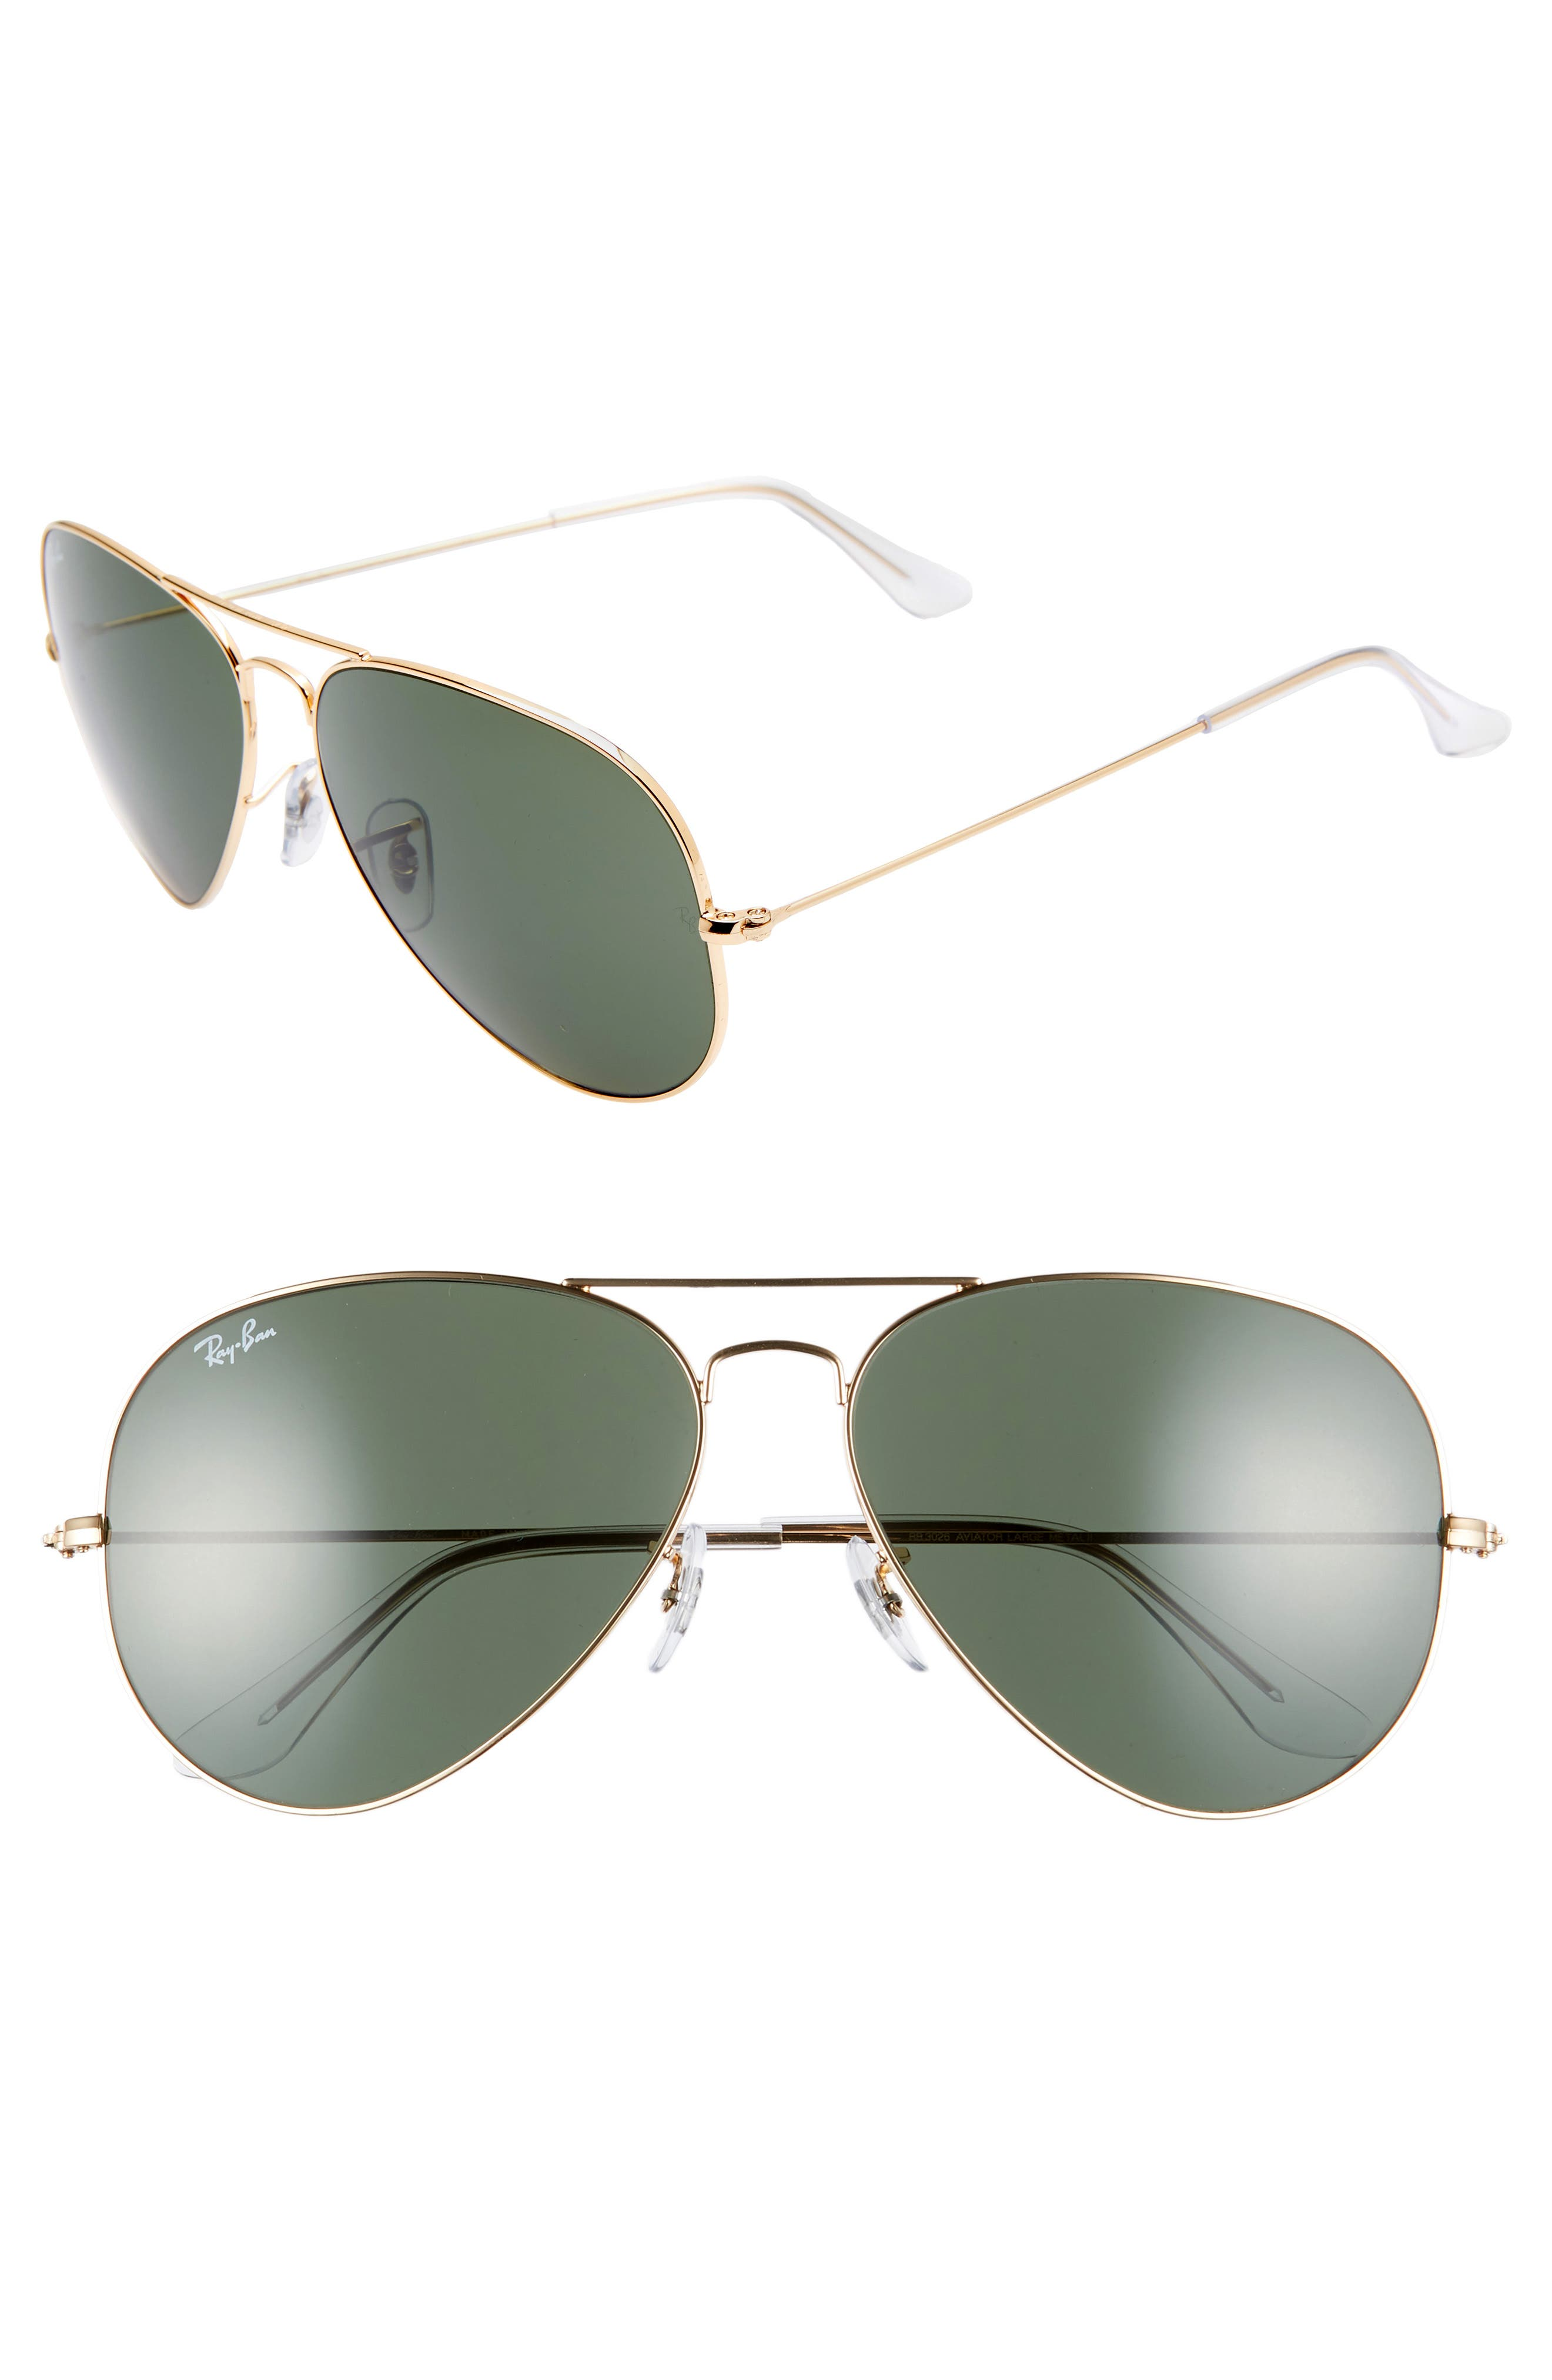 Ray-Ban 62Mm Aviator Sunglasses - Gold/ Green Solid